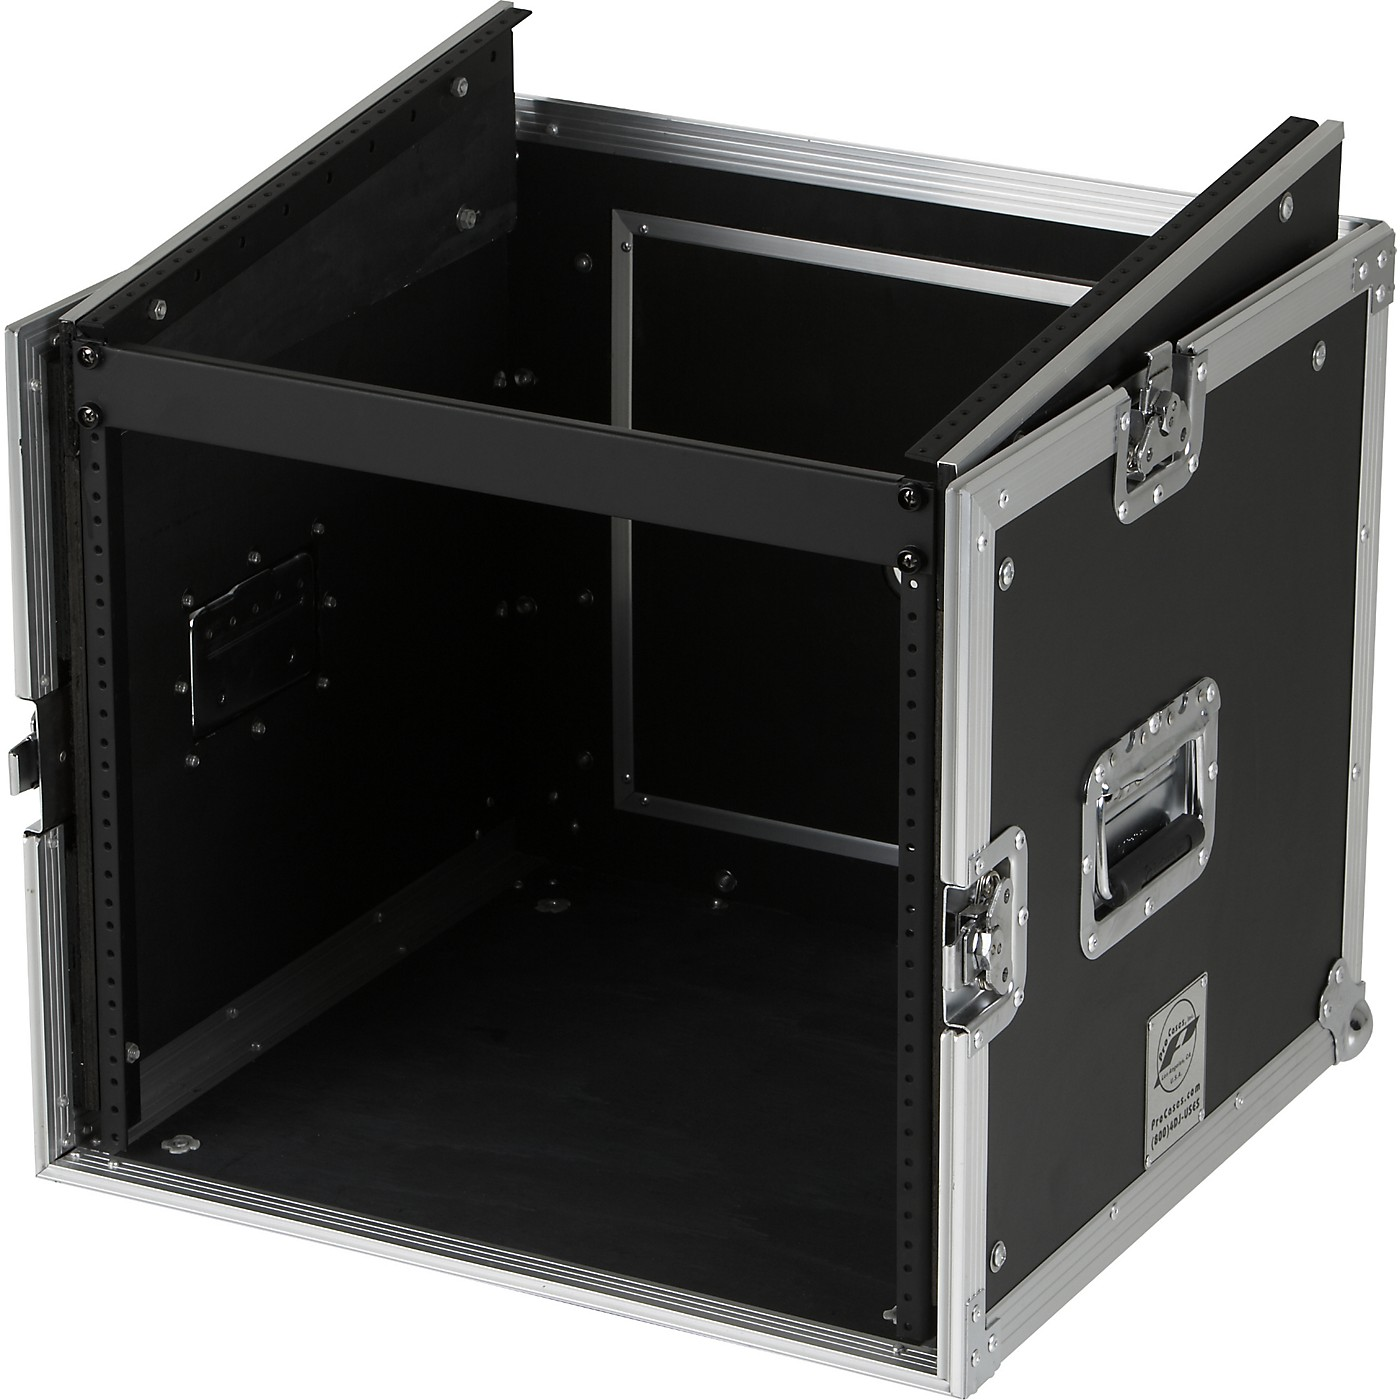 Eurolite 10x8 Mixer/Amp Combo Rack Case thumbnail